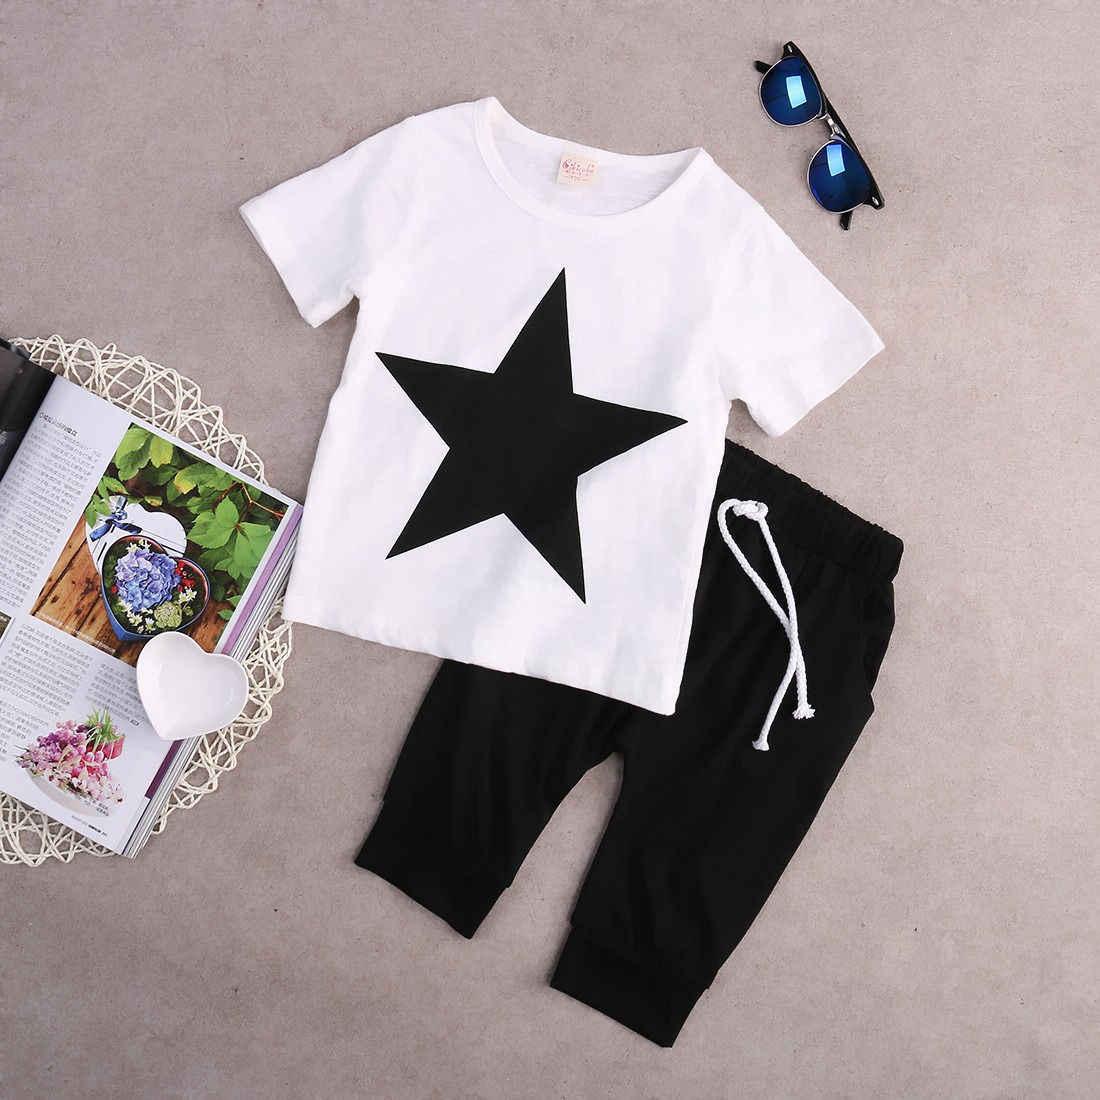 9616c1599 ... Kids Baby Boys Casual Star T-shirt Tops +Harem Pants 2 pcs Outfits  Toddler